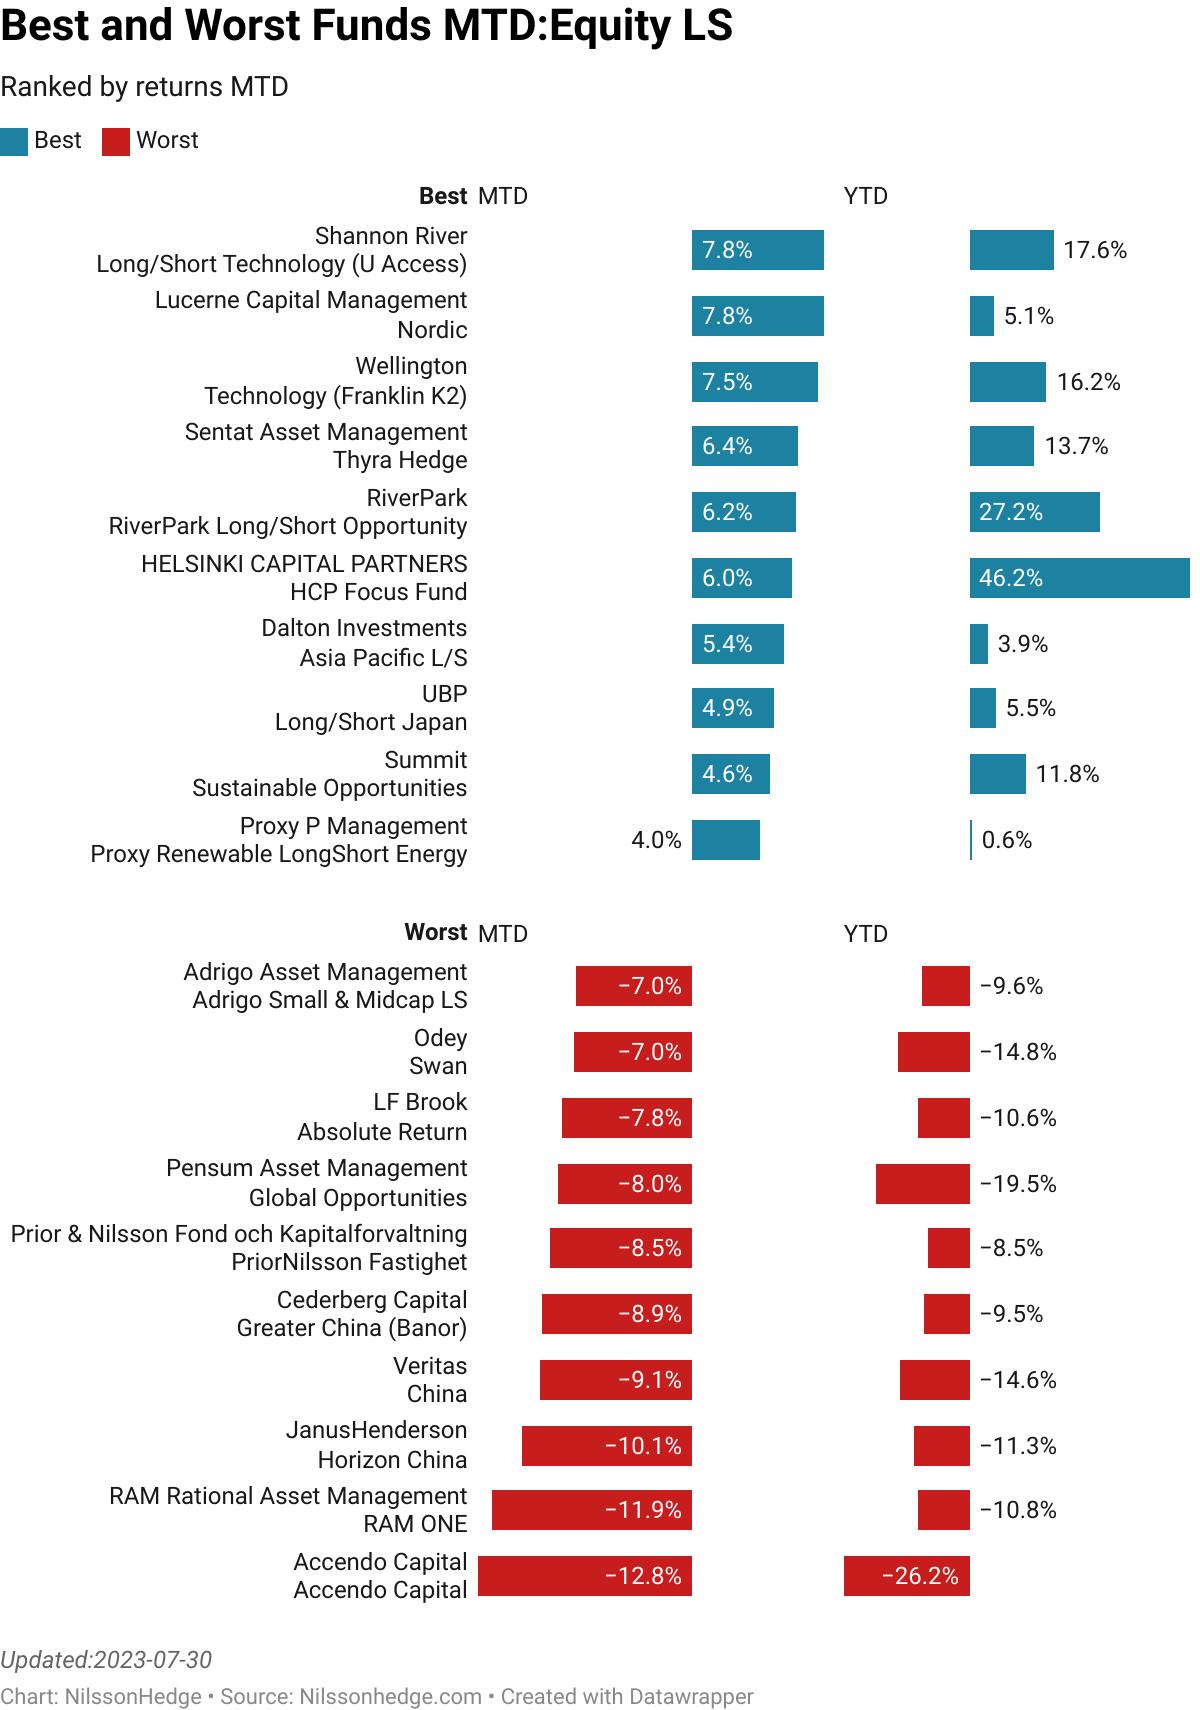 Best/Worst Equity Long/Short MTD, Managed Futures Performance, Flash Gotham, AQR, JanusHendersen